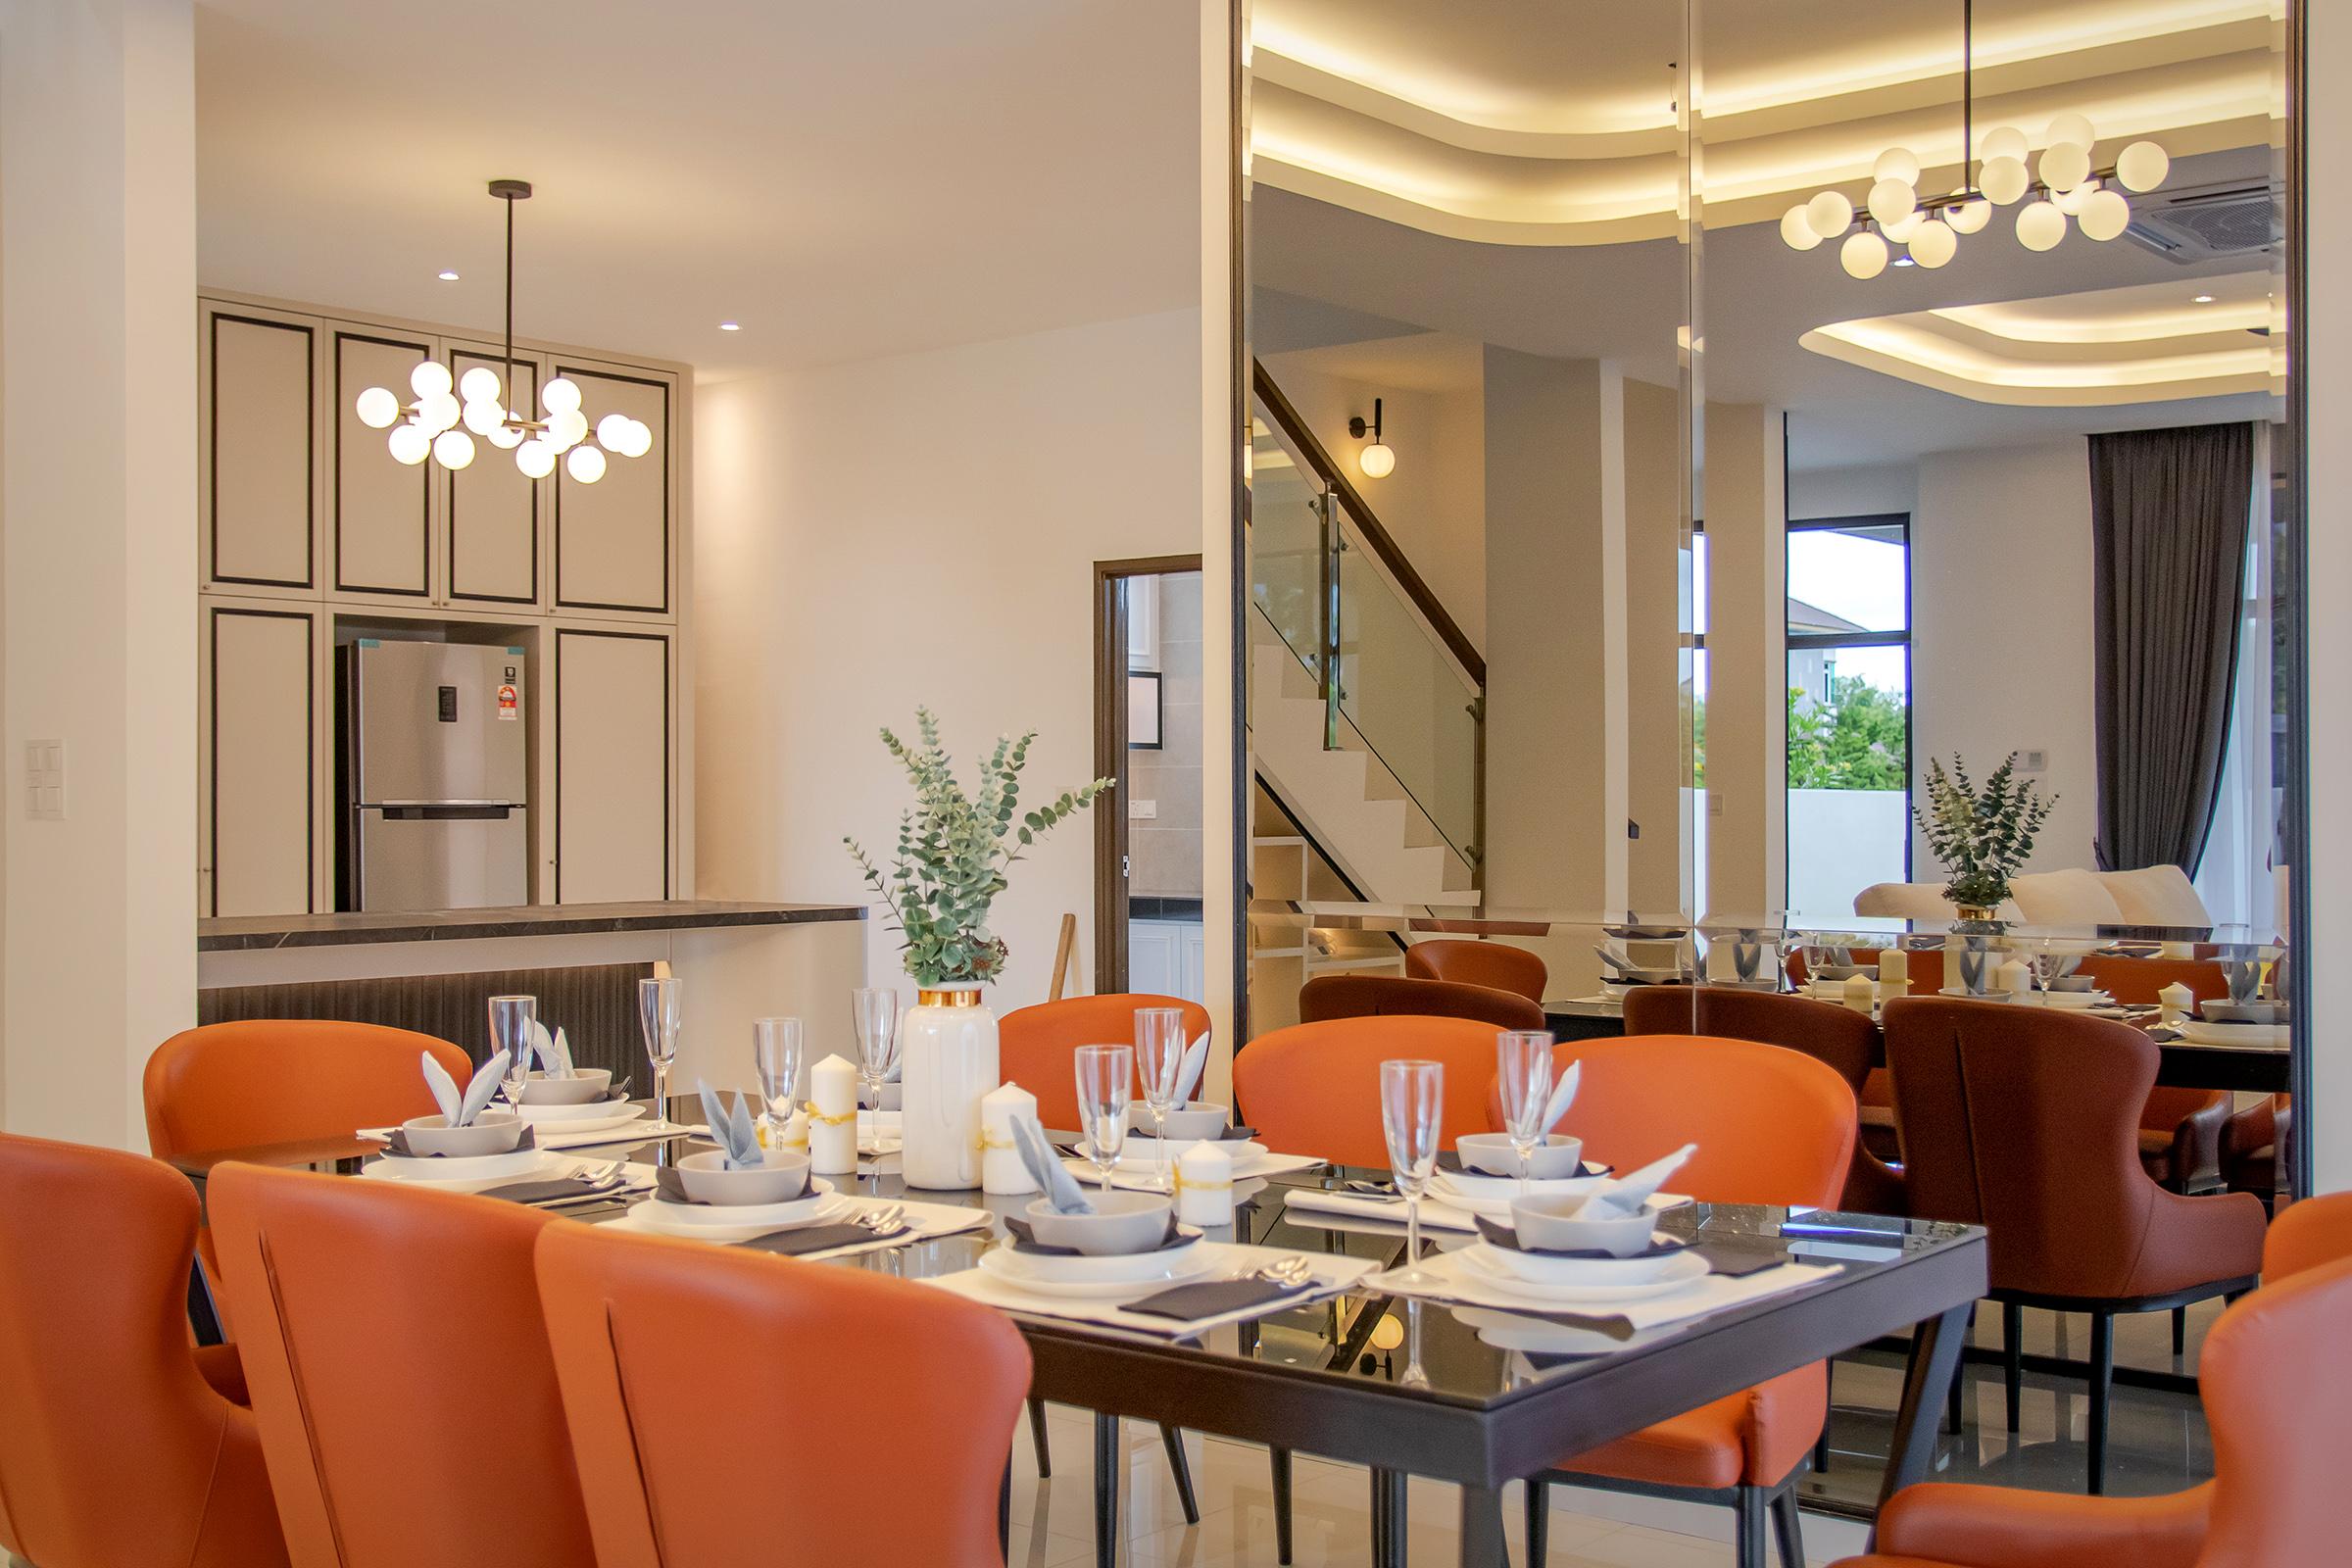 Ixora2 dining hall